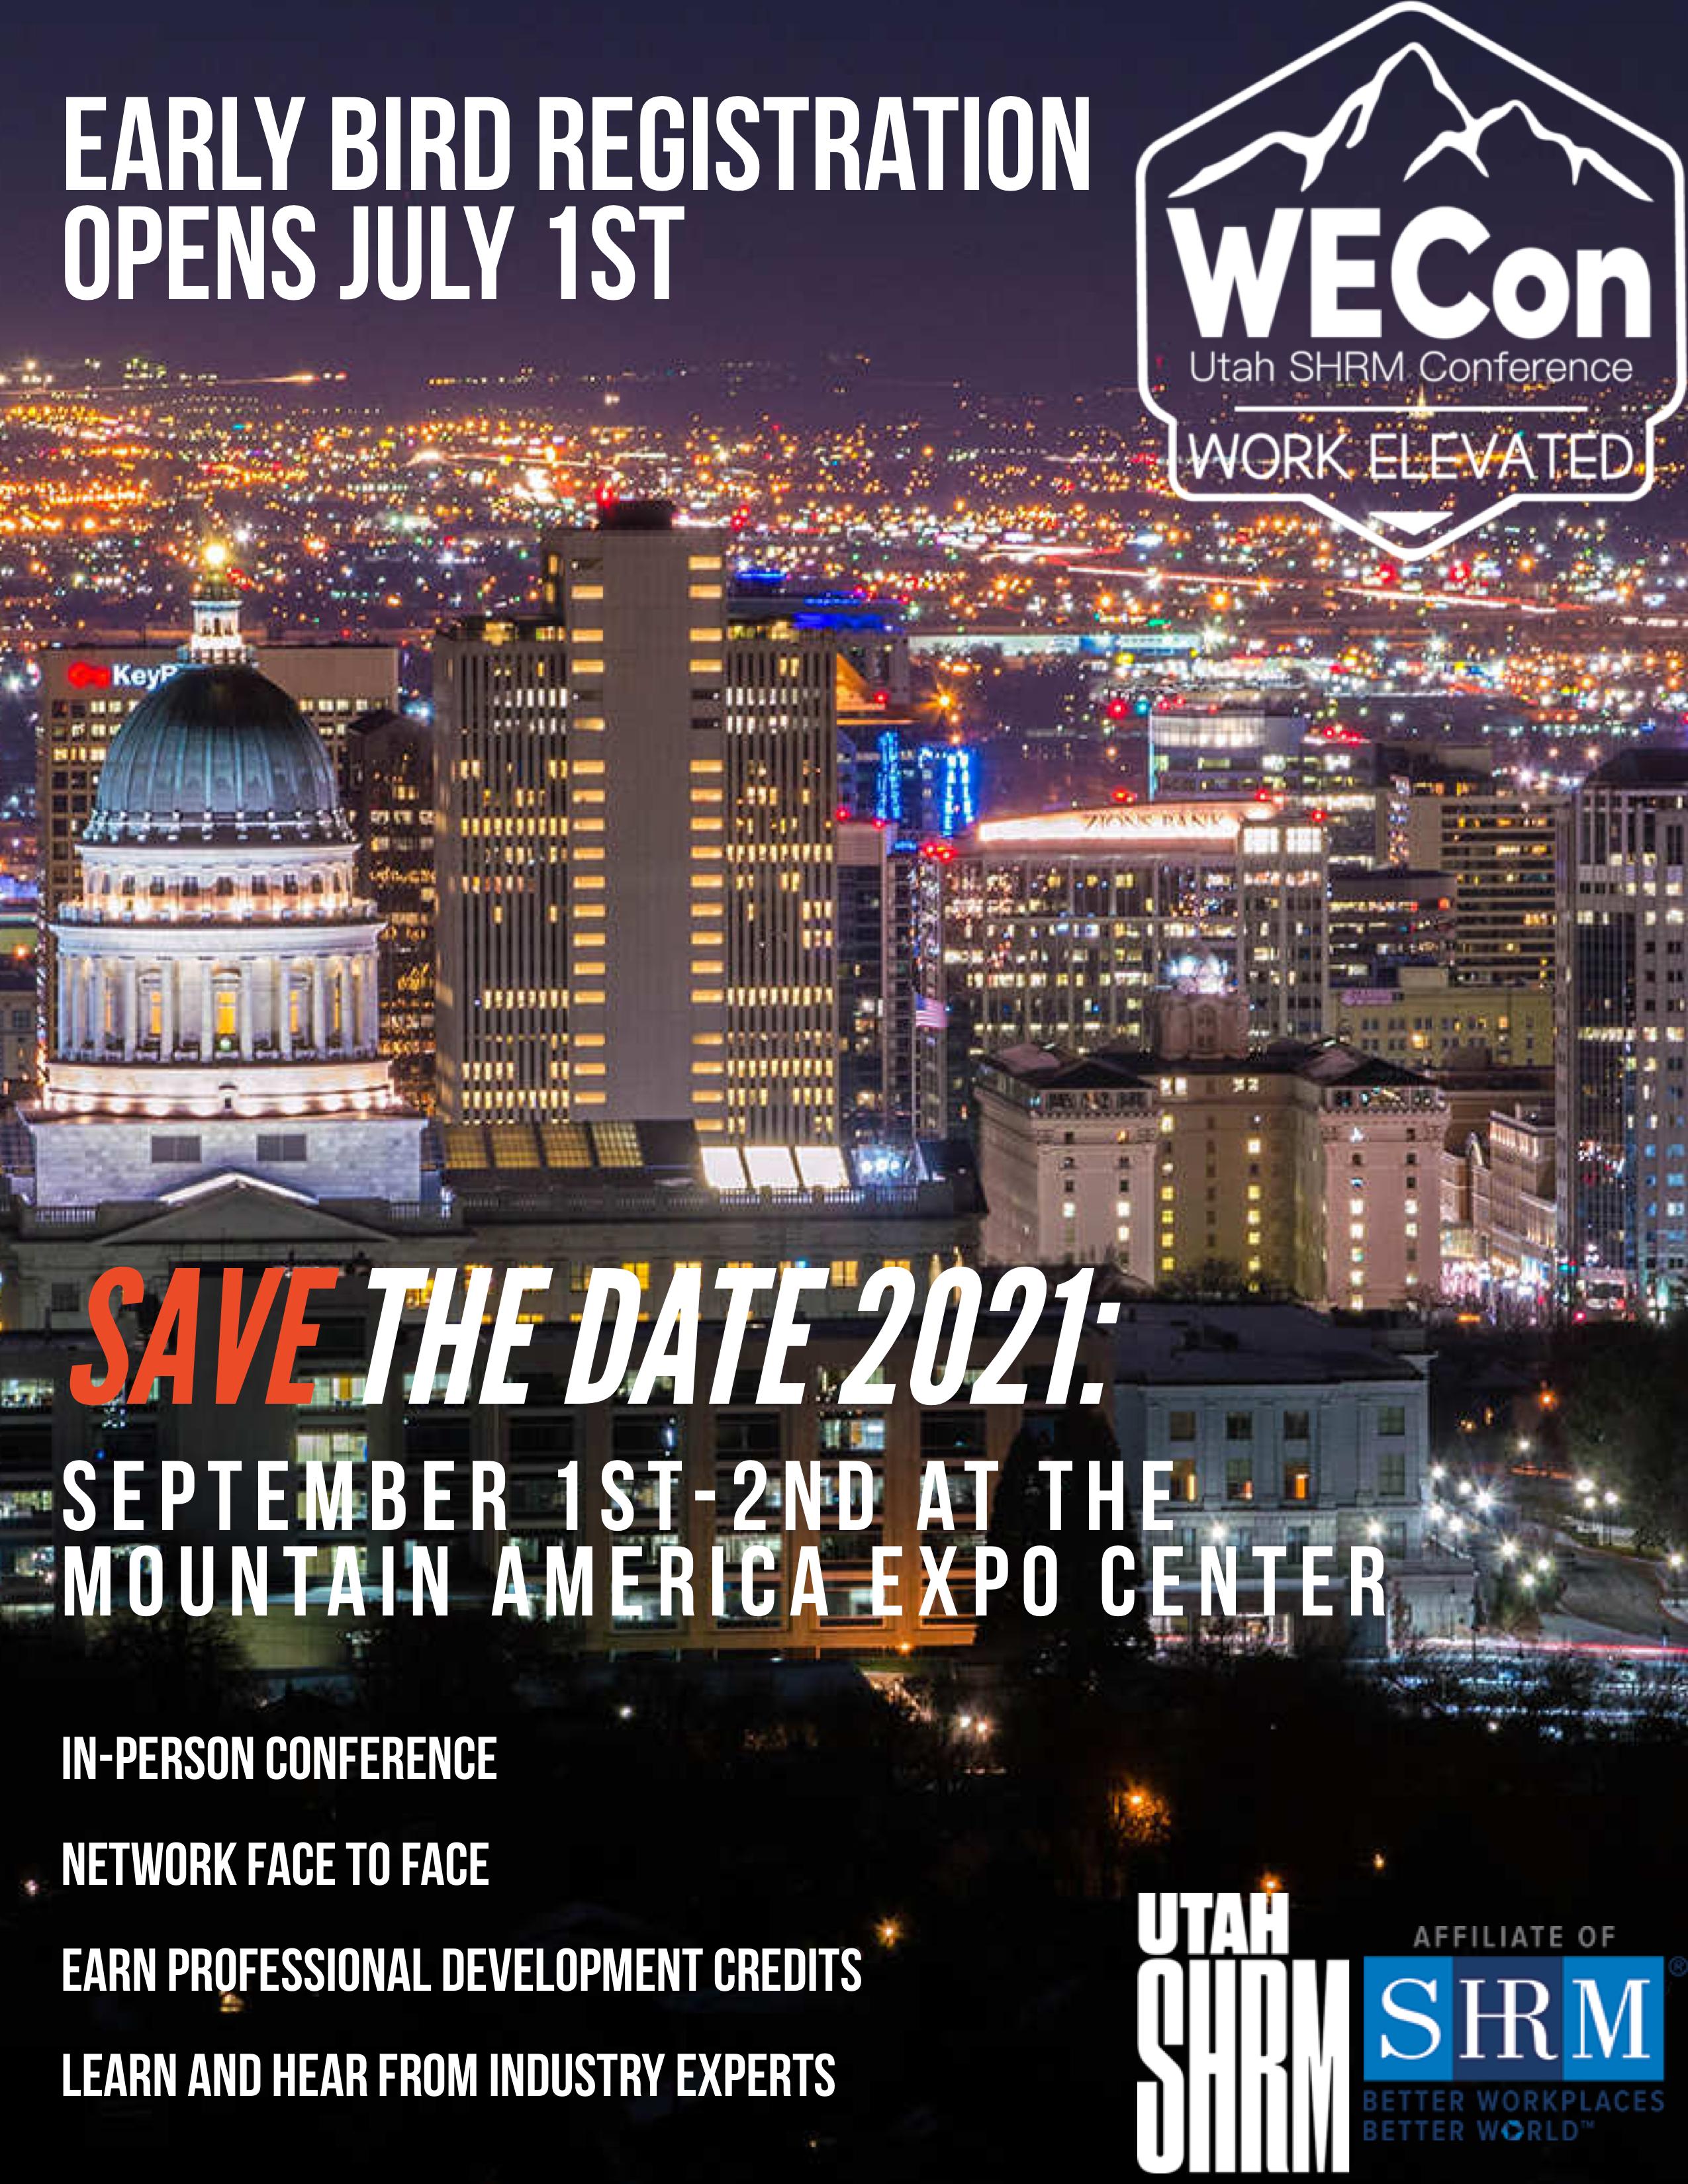 Utah SHRM Conference